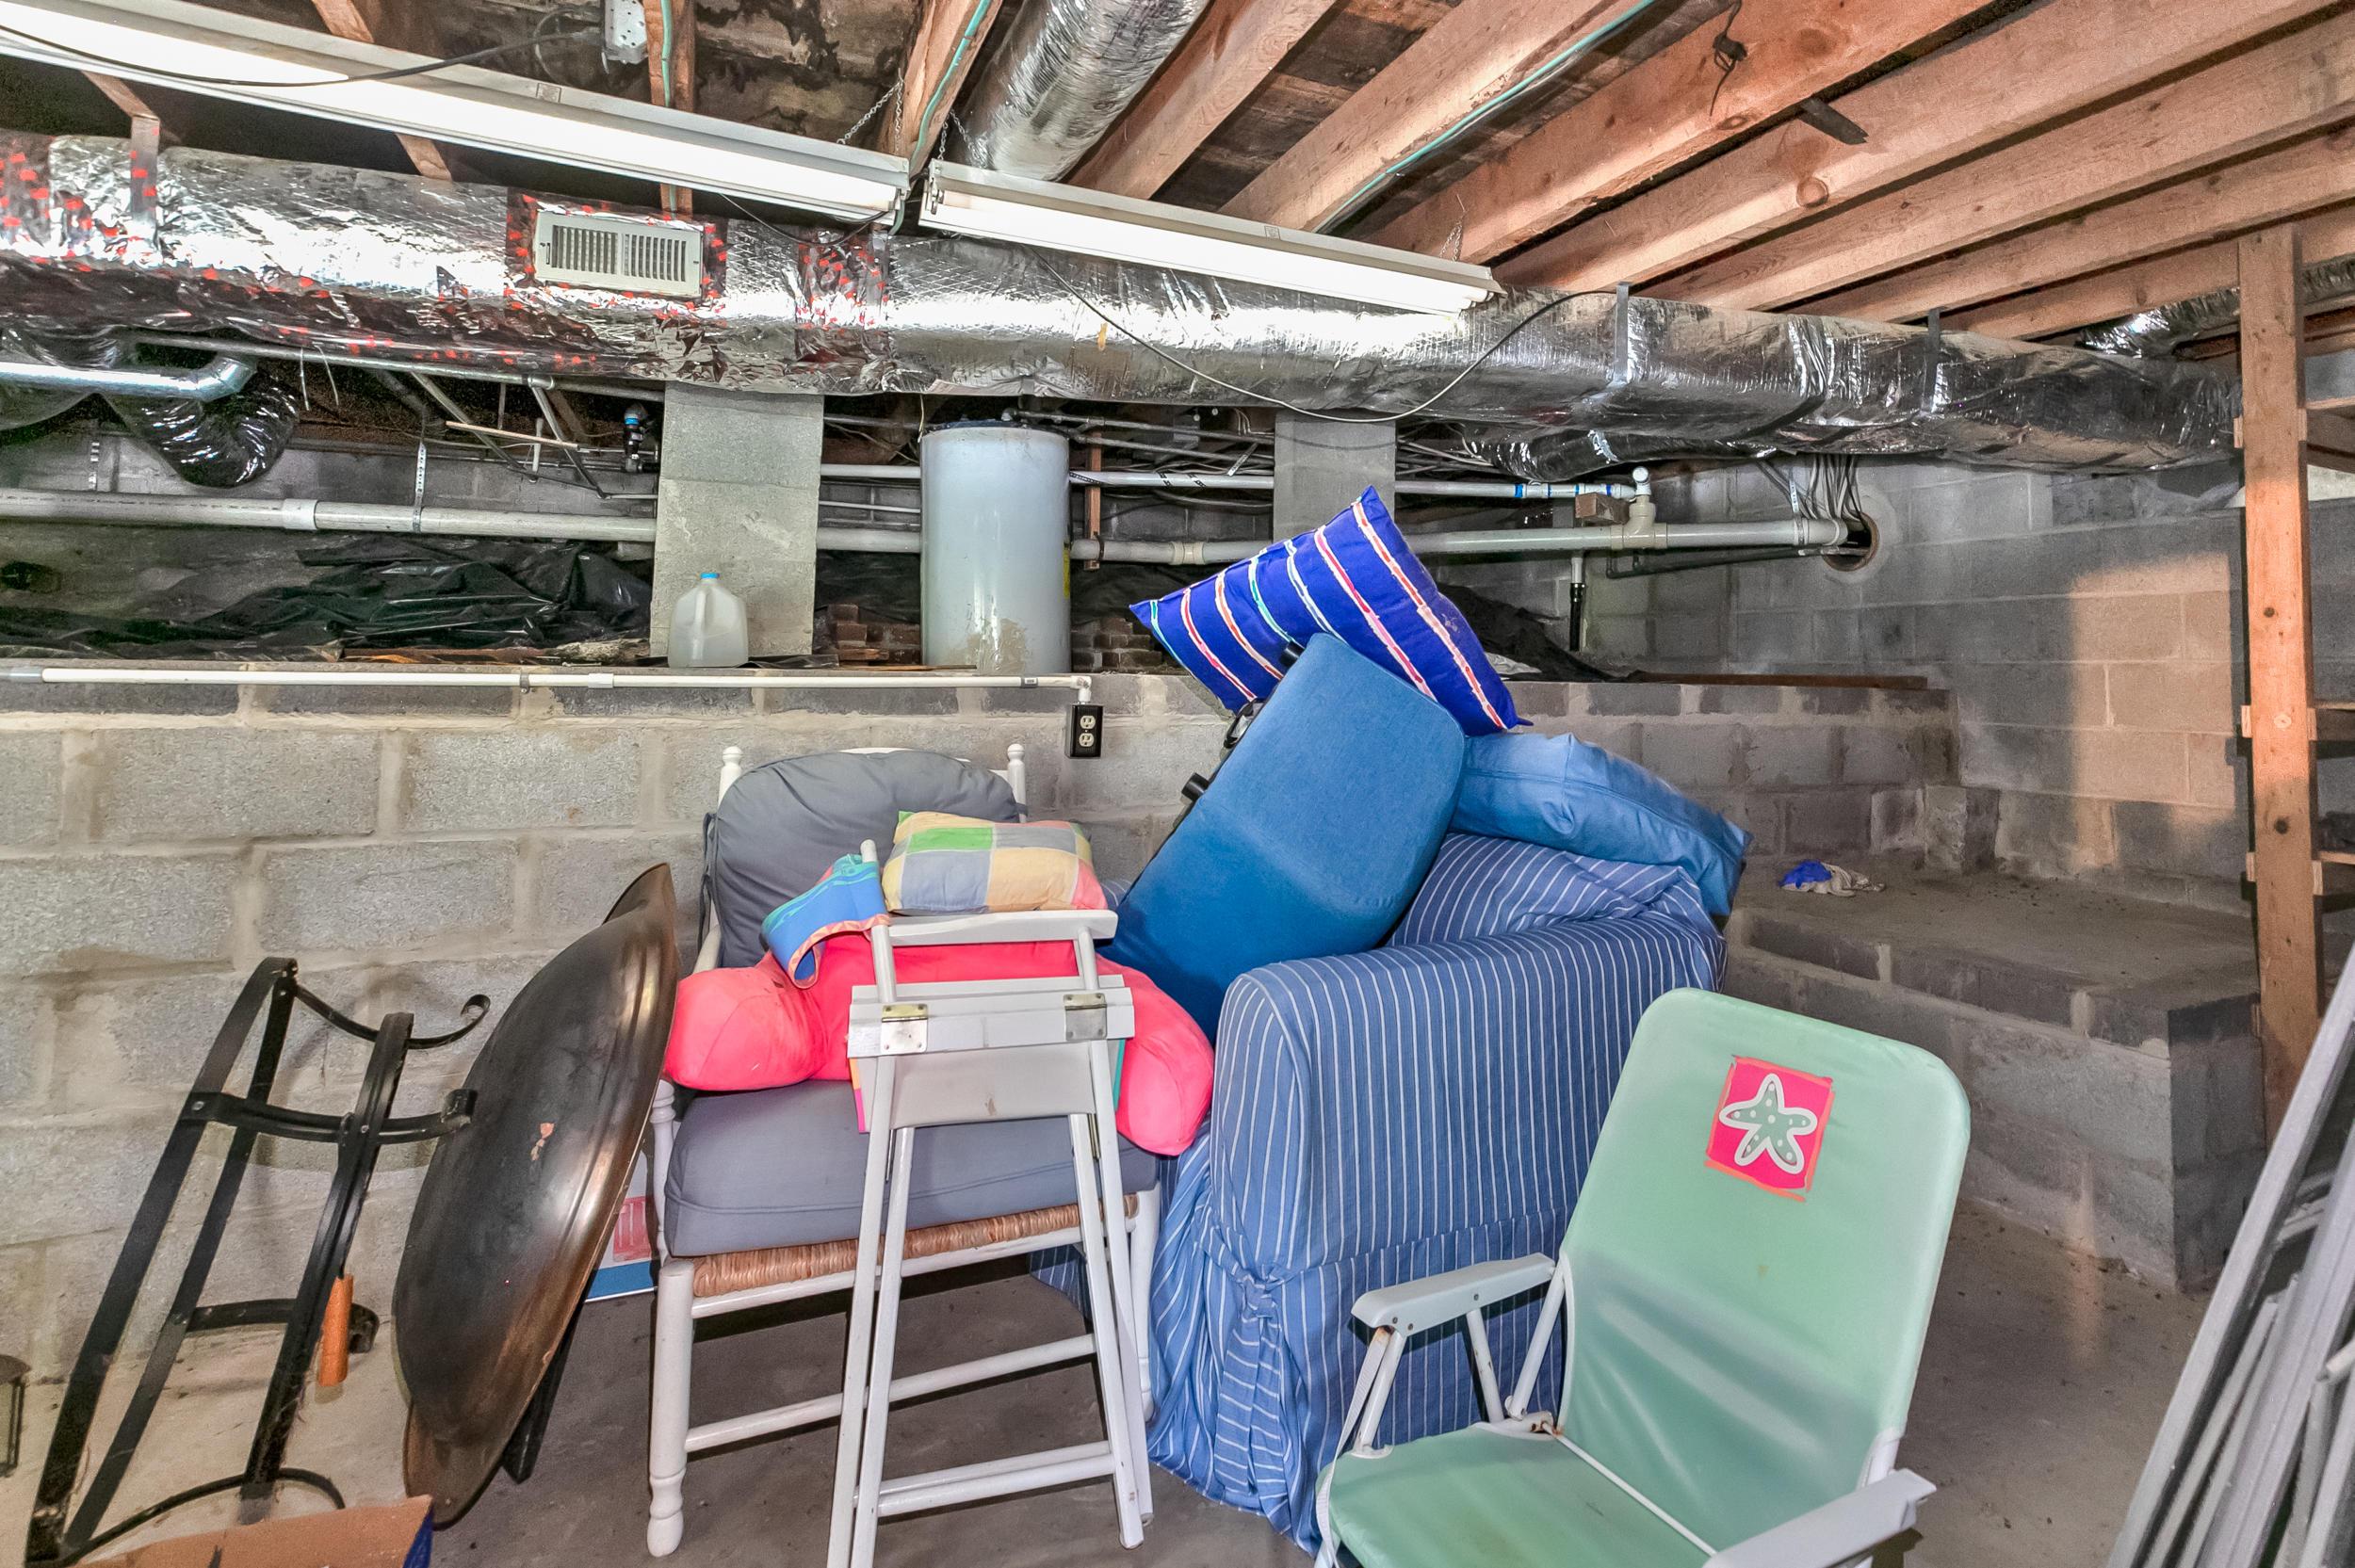 780 Indian River Boat Dock Rd: